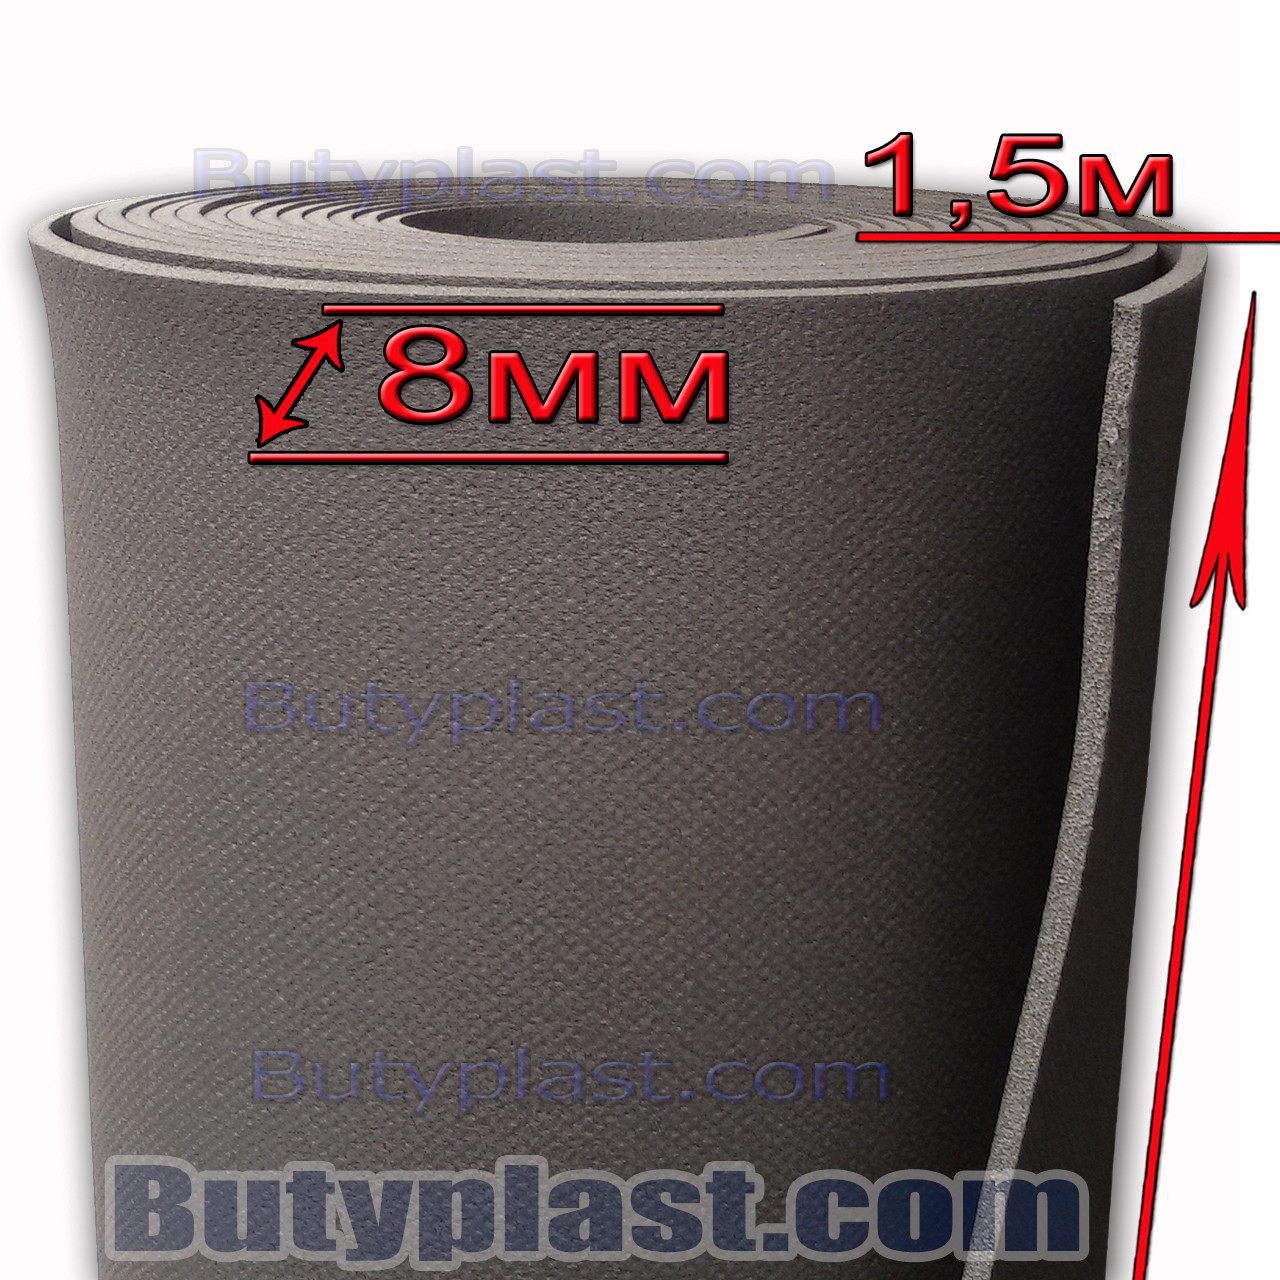 Шумоизоляция Isolon 8мм БК - Виброизоляция Butyplast в Харькове